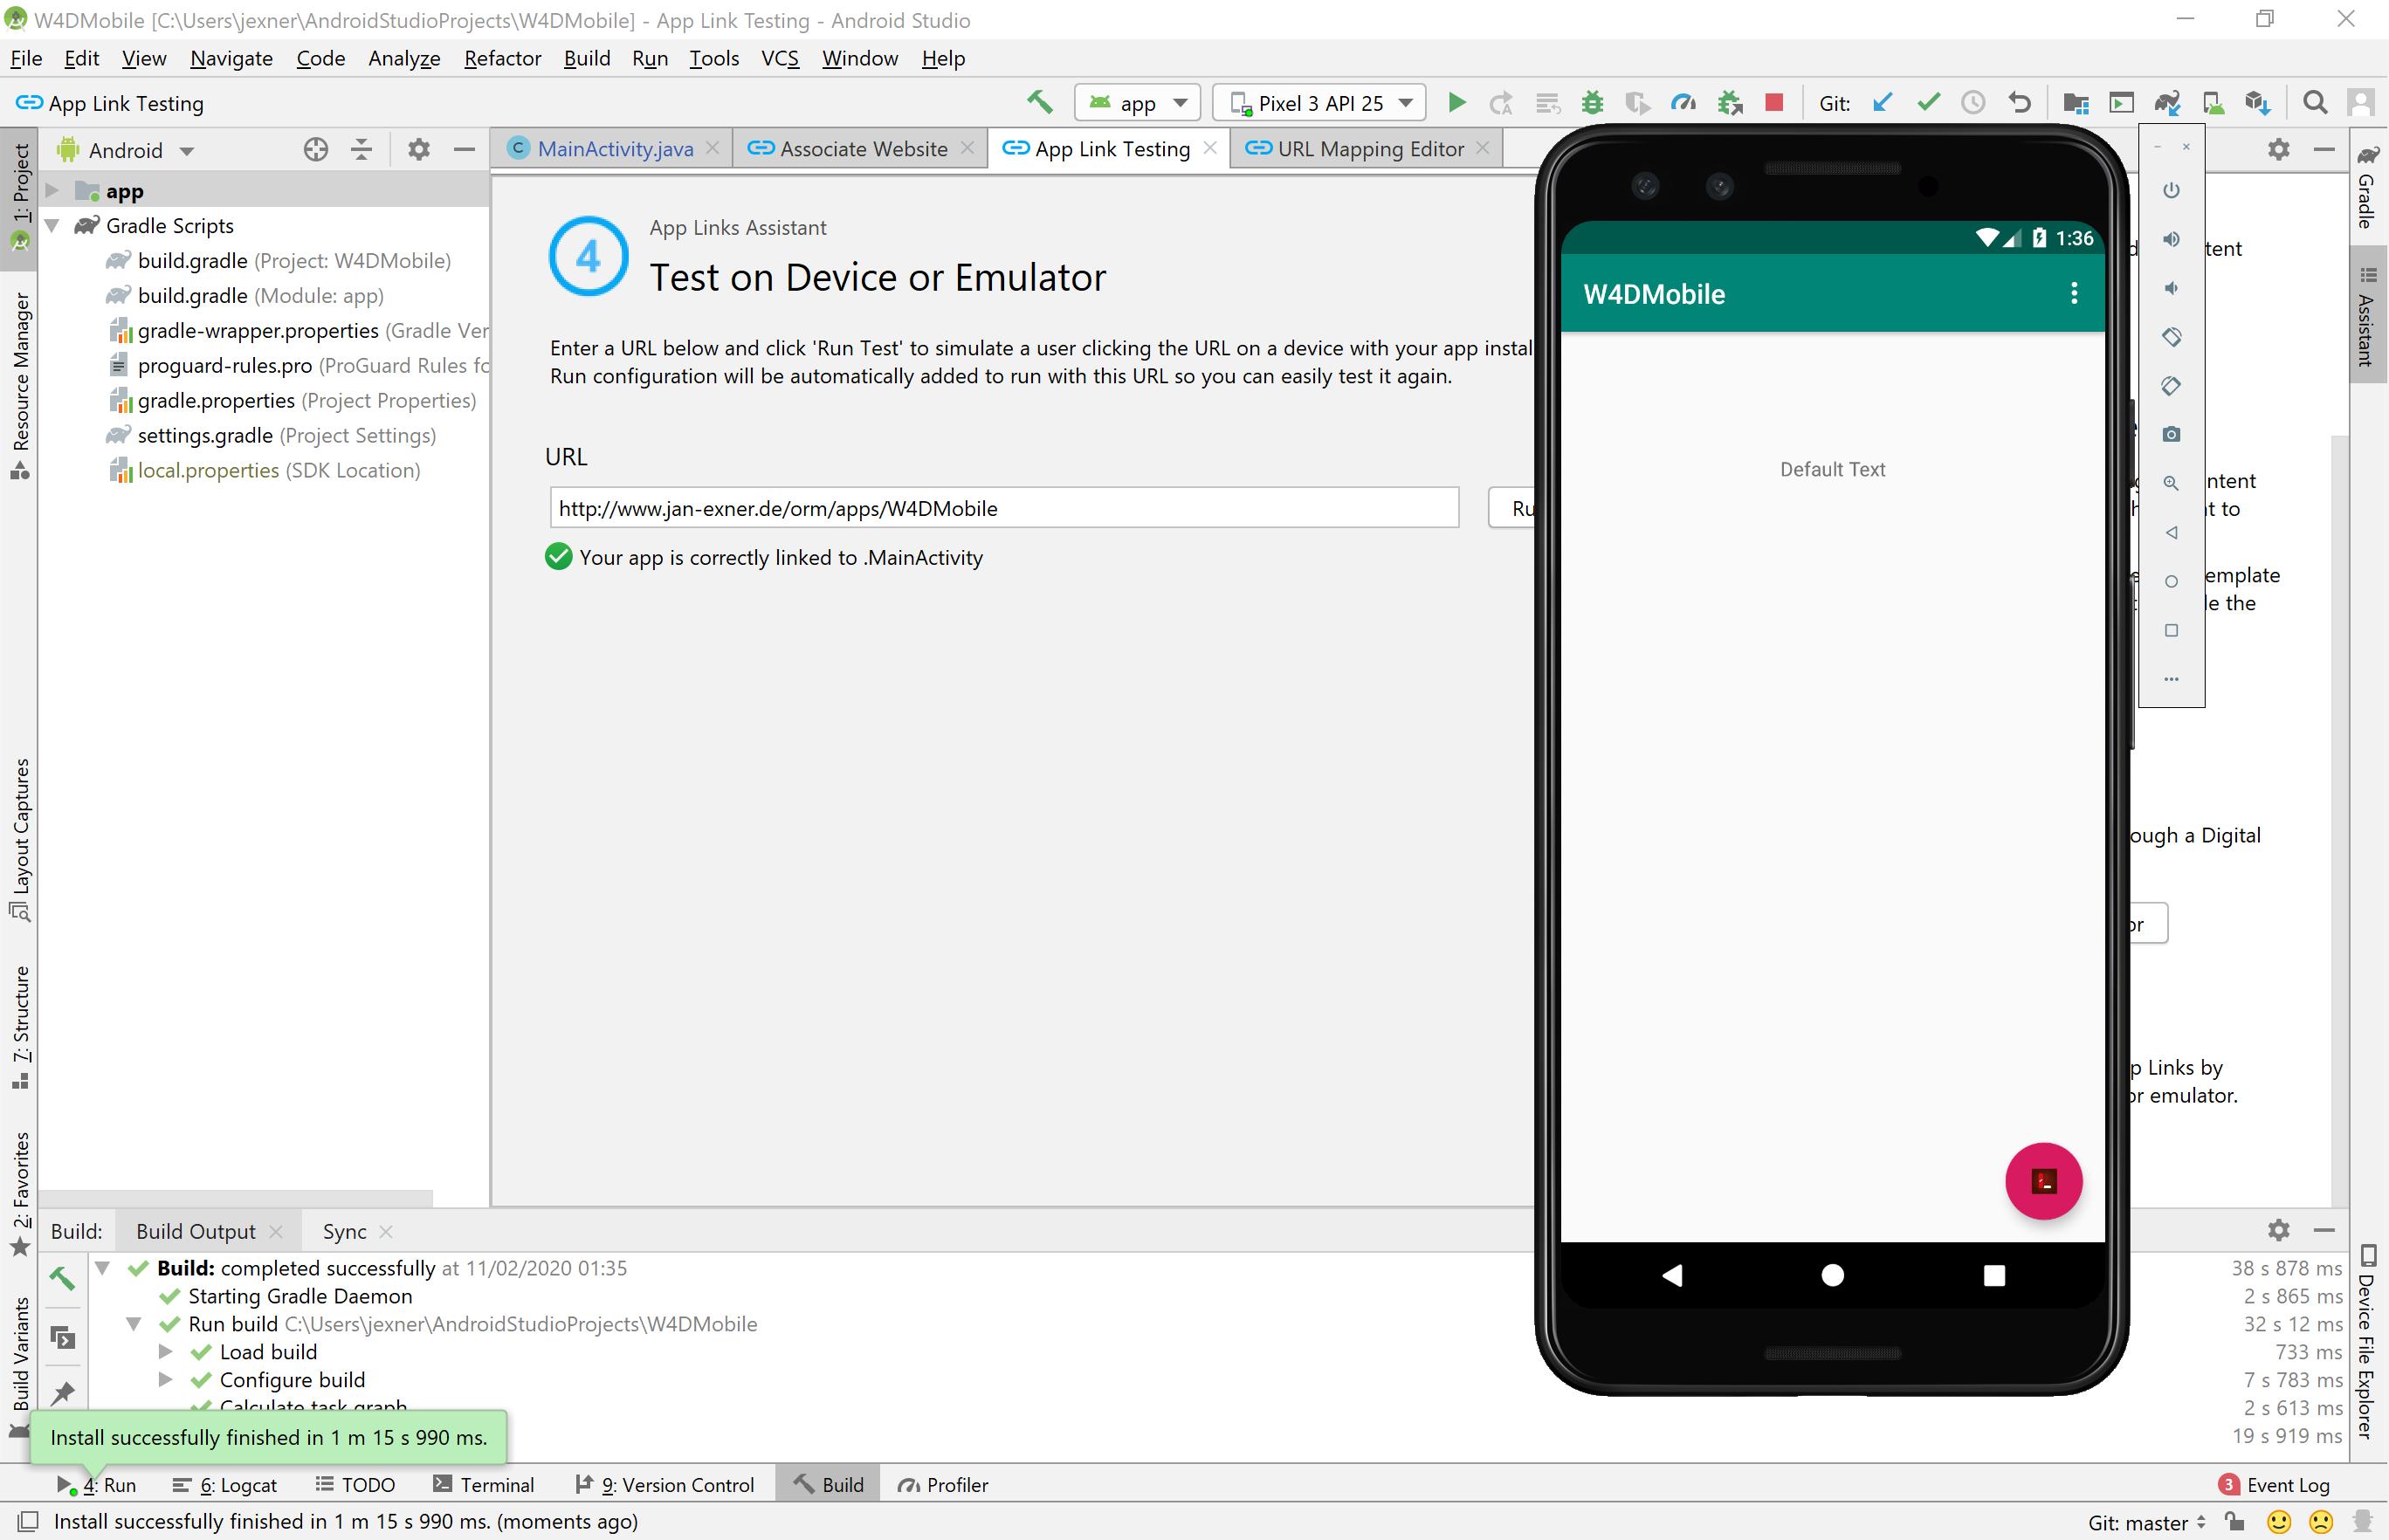 Adobe Experience Platform Mobile SDKs – Deep Links (more setup)